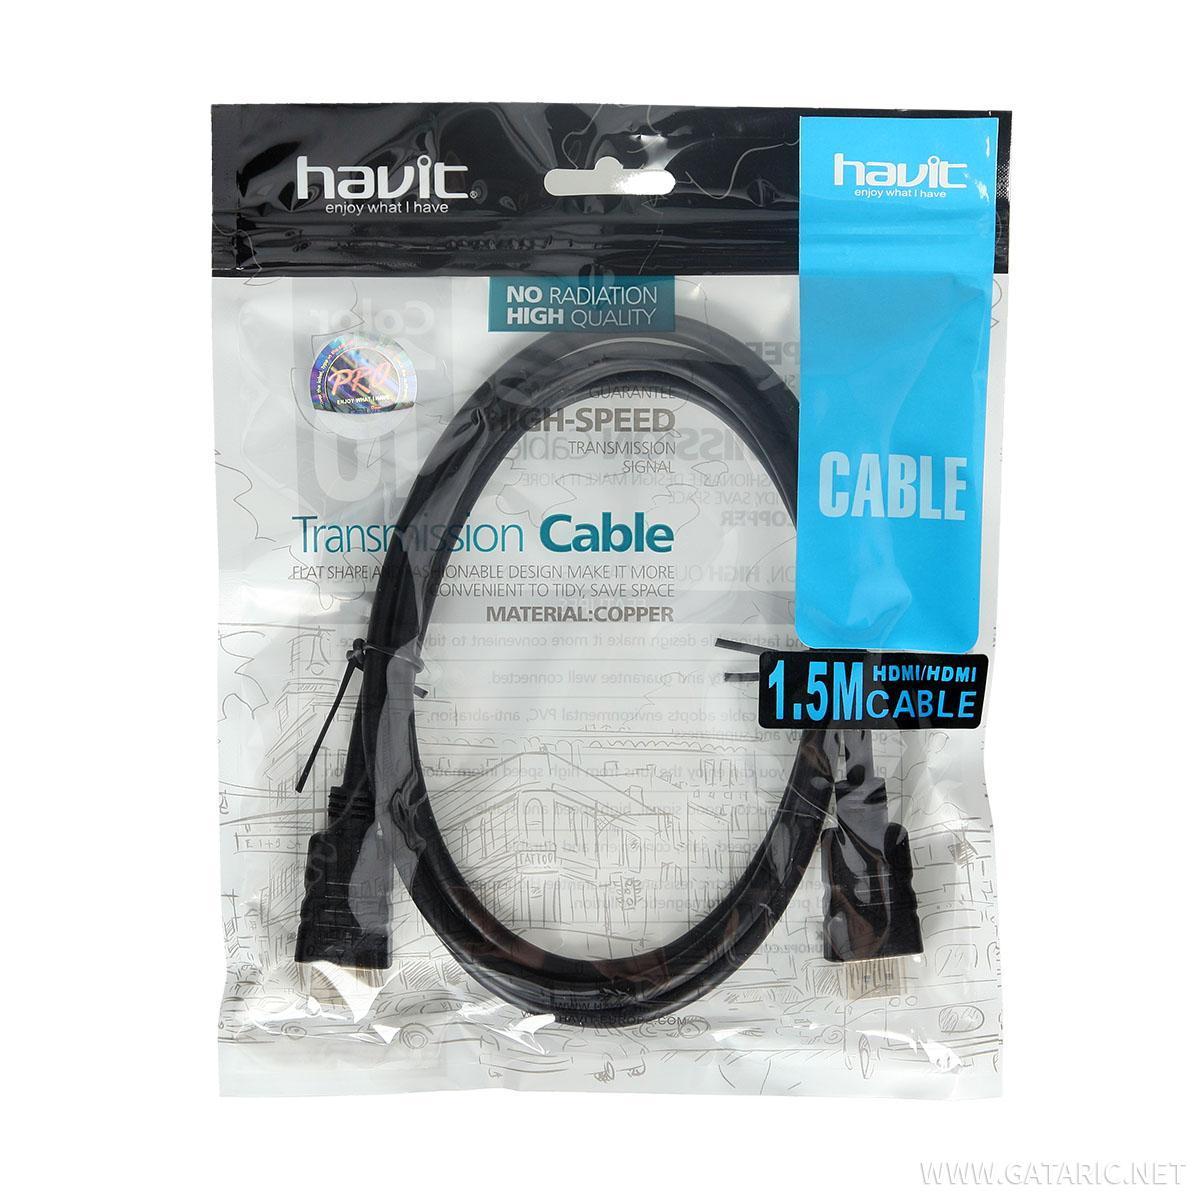 HDMI kabal 1.5m, 1.4PB